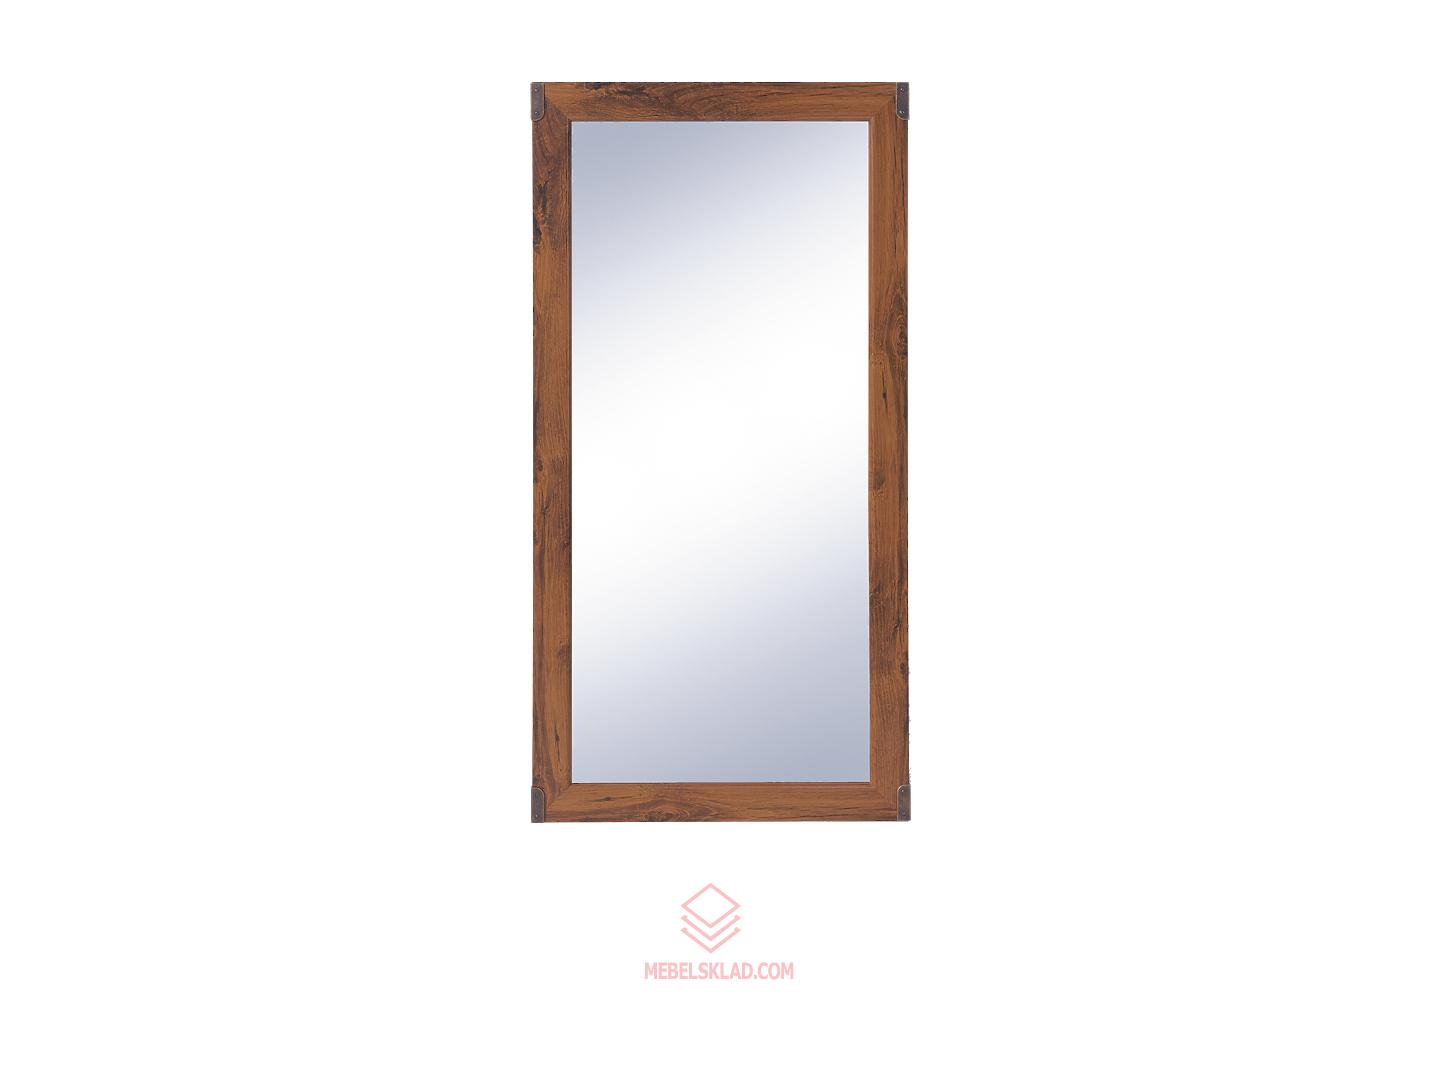 Зеркало ИНДИАНА JLUS 50 за 3301 ₽